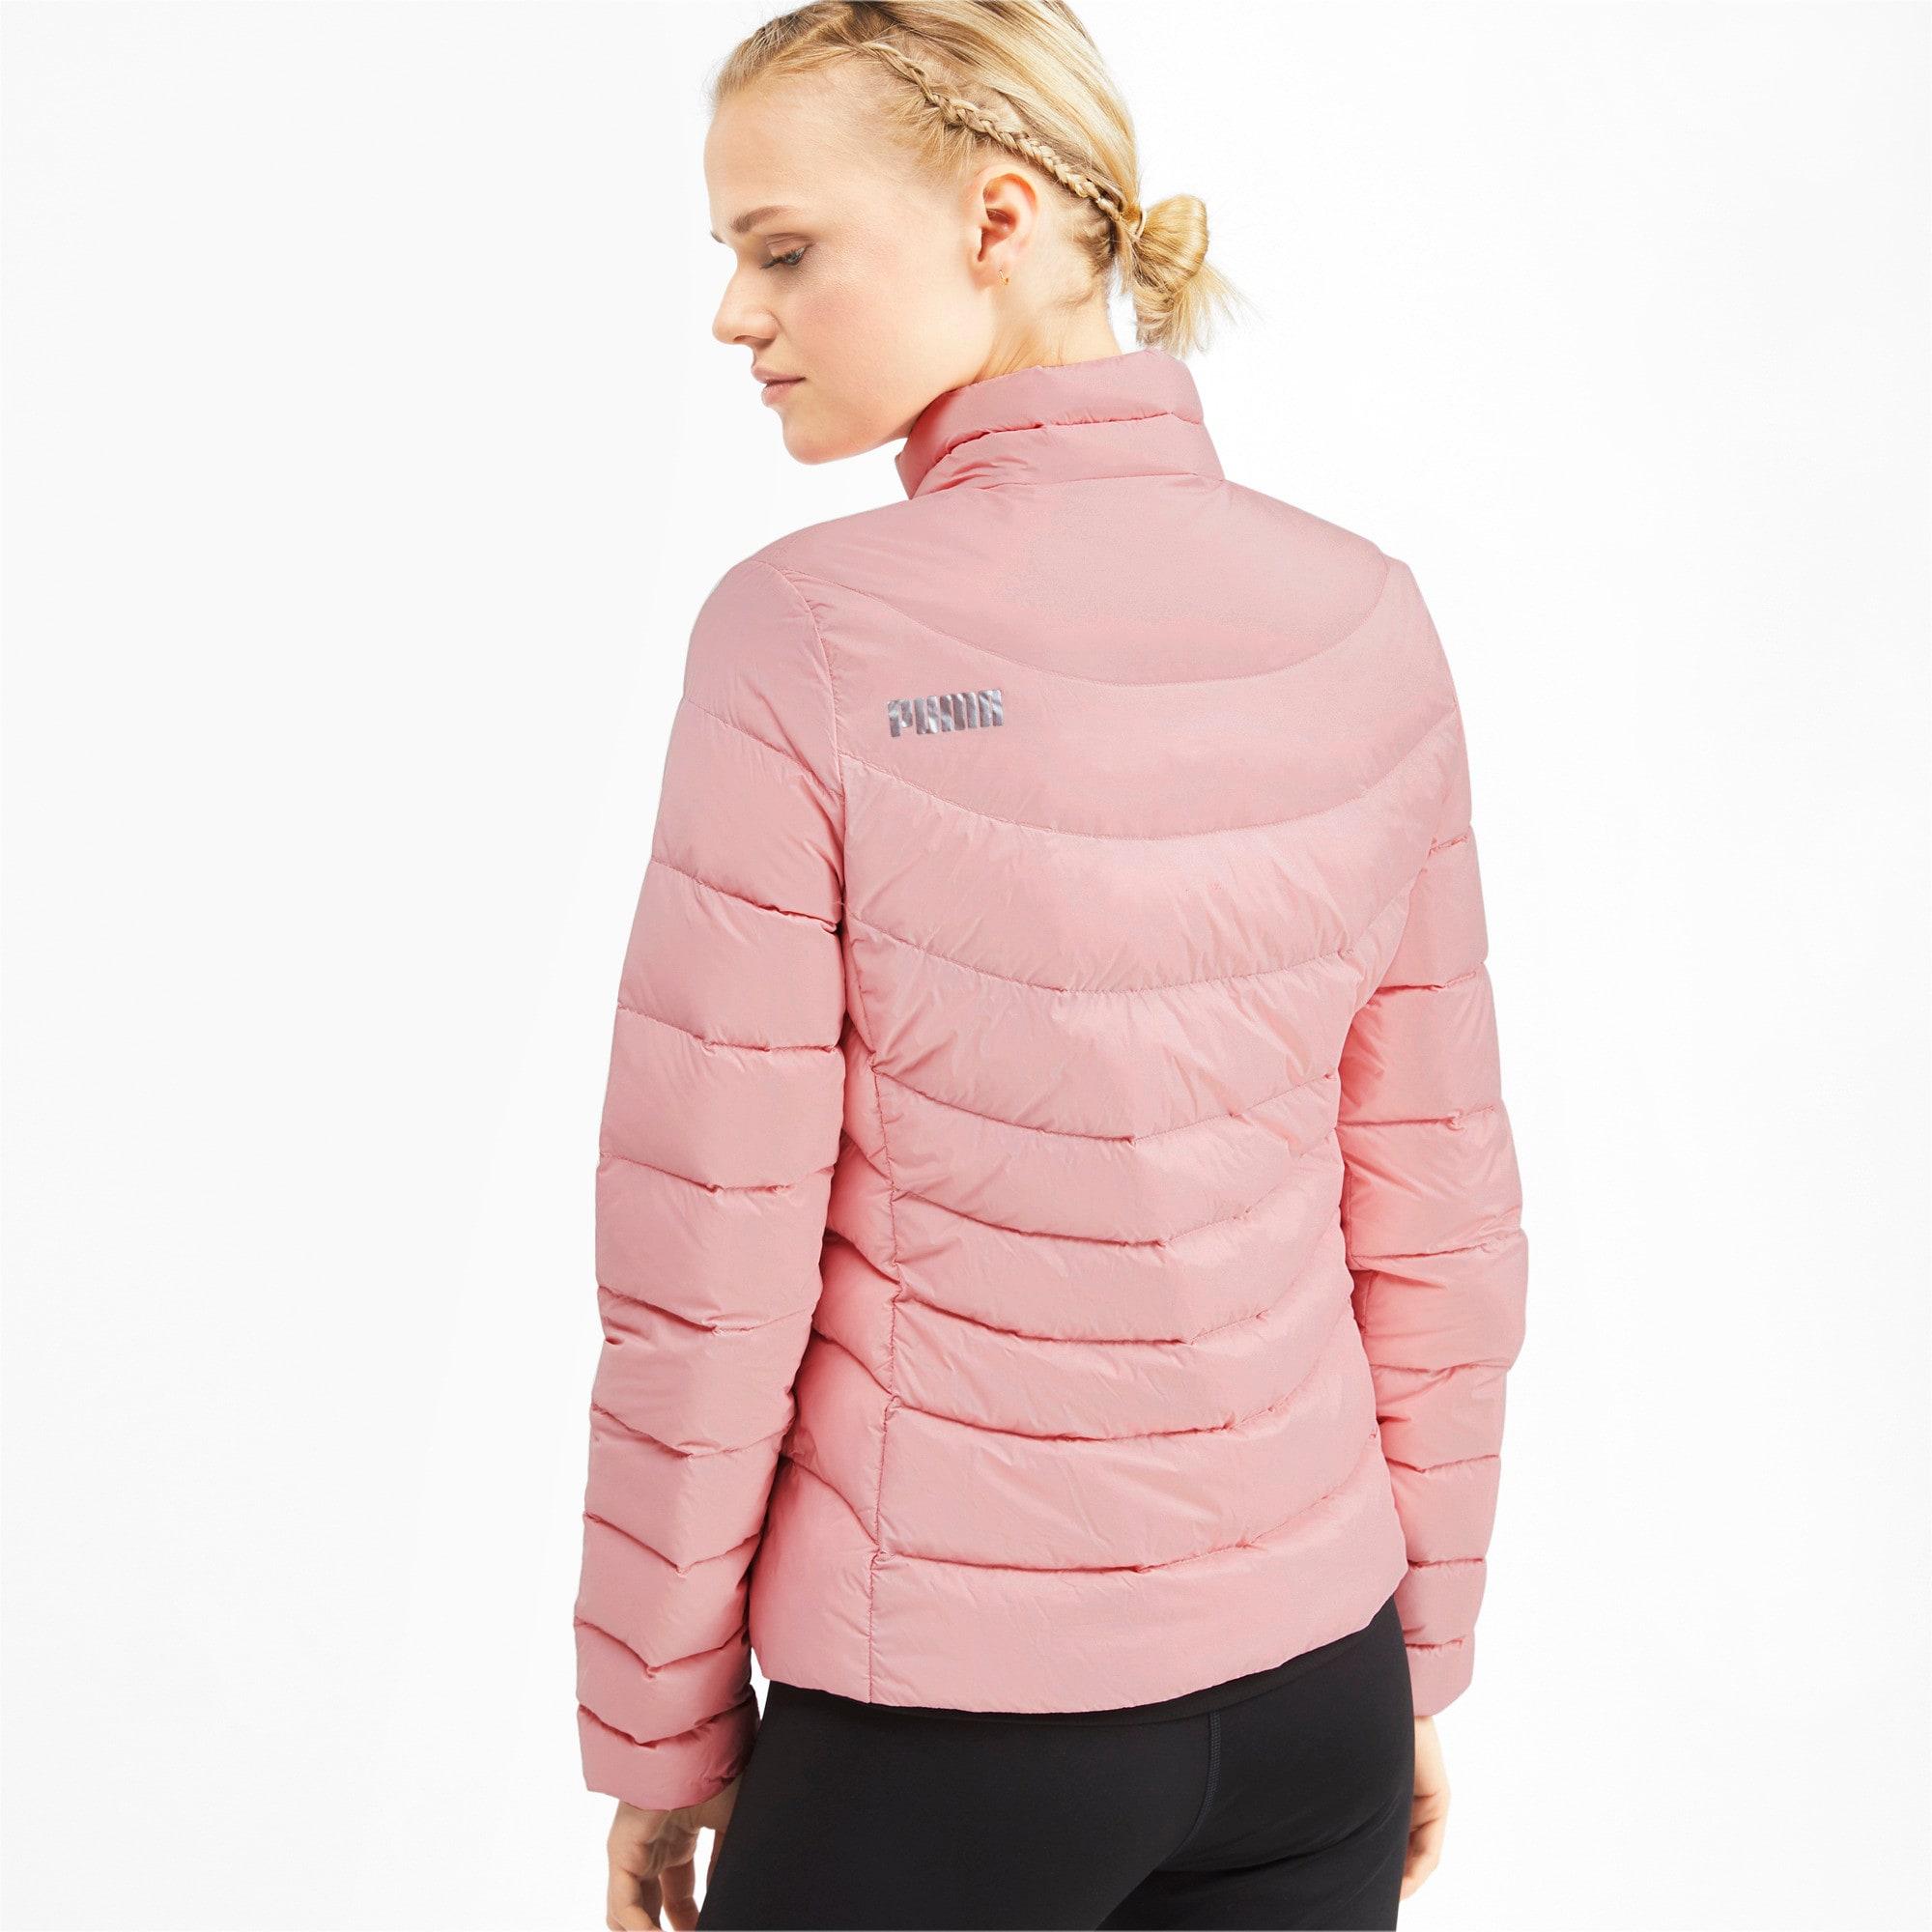 Thumbnail 2 of PWRWarm packLITE 600 Down Women's Jacket, Bridal Rose, medium